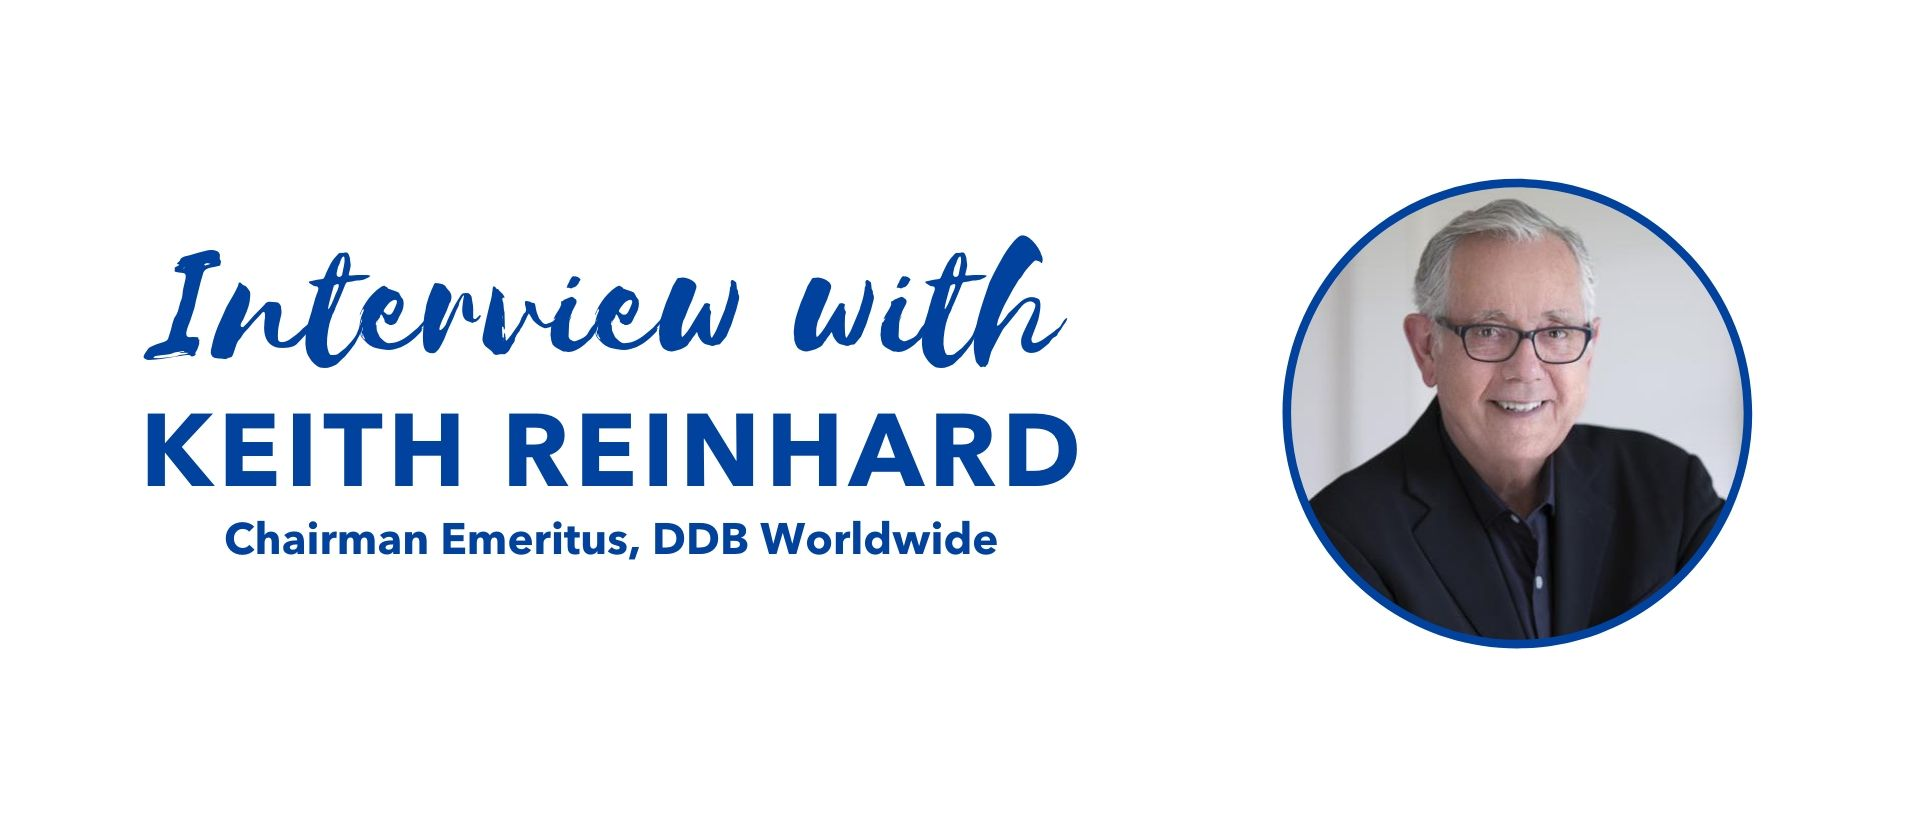 Keith Reinhard Interview with the Millenium Alliance